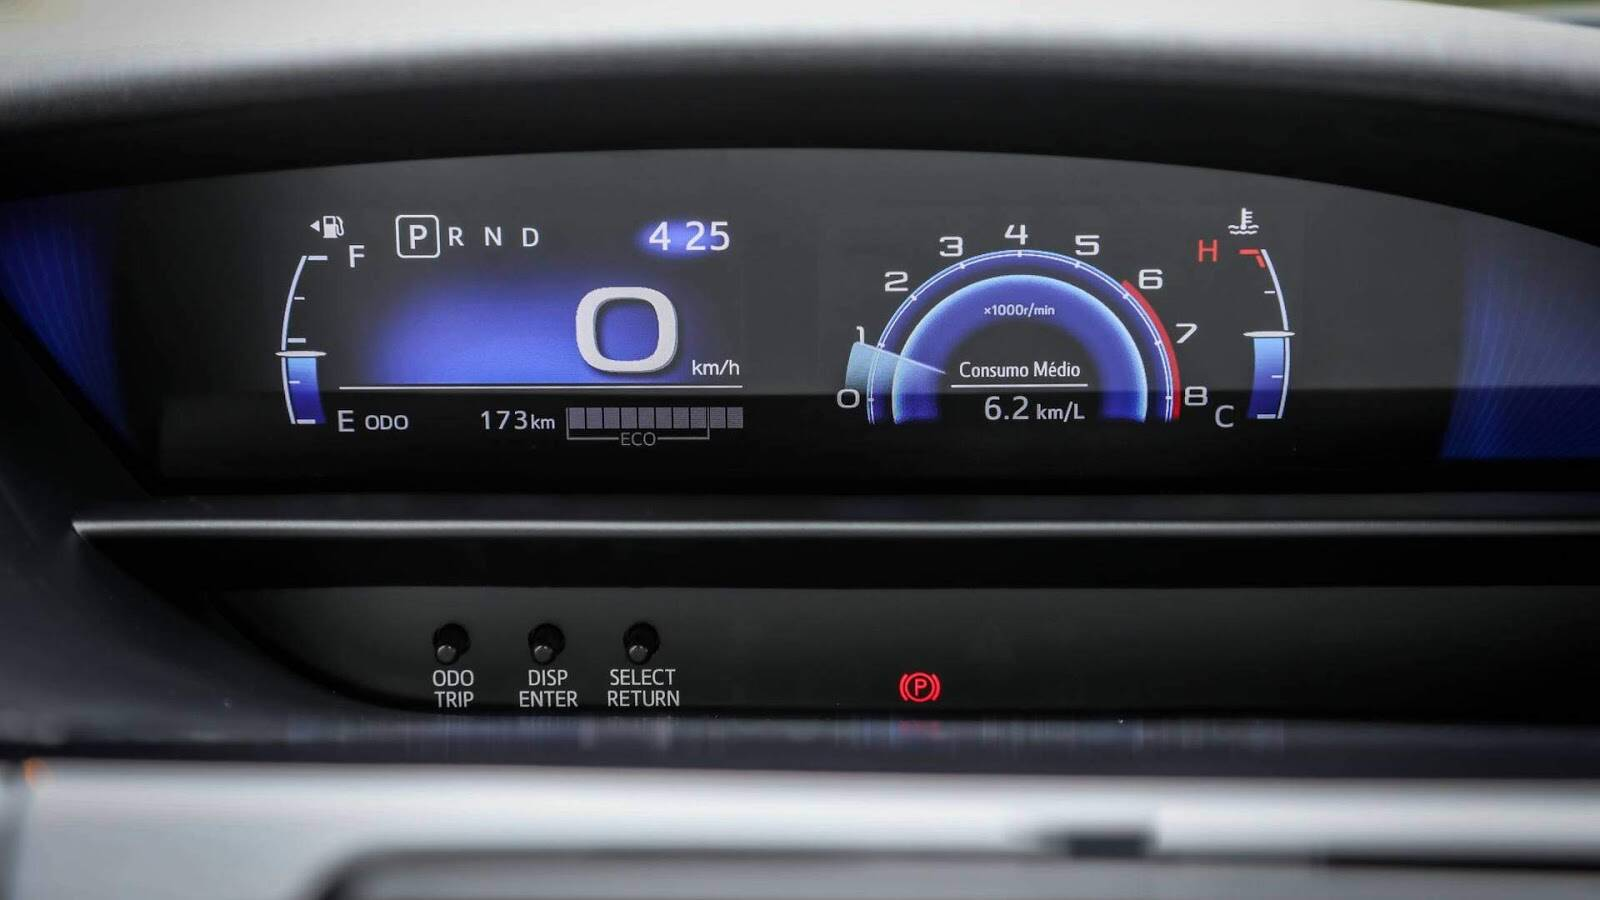 Toyota Etios Sedan 1.5 2019. Foto: Divulgação